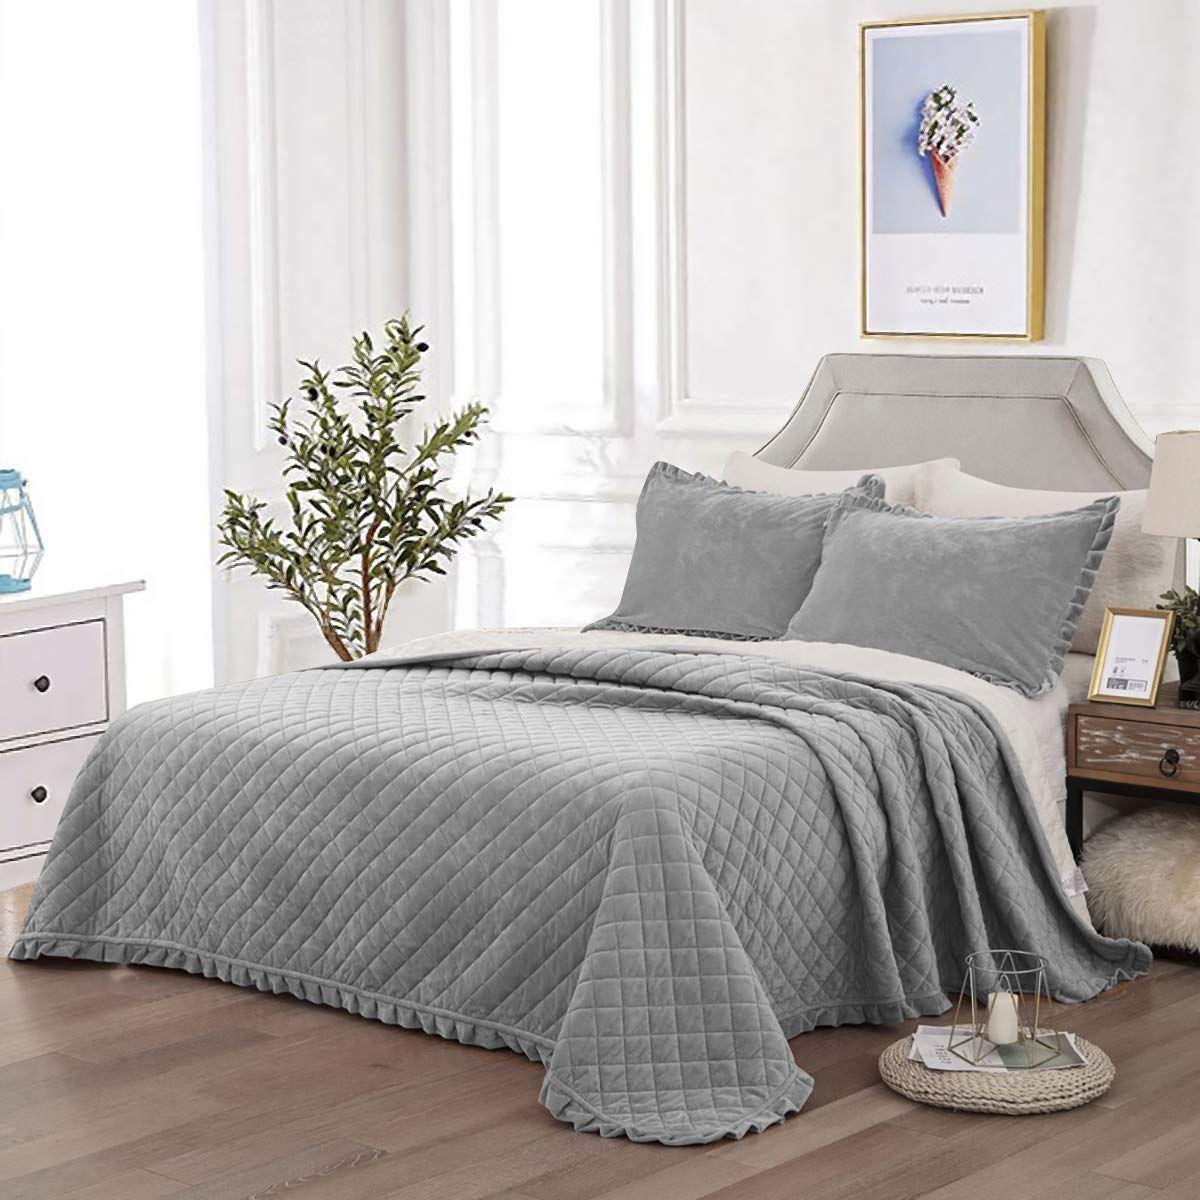 Wongs Bedding Tagesdecke Bettüberwurf 220x240 Cm Steppdecke Doppelbett Gesteppt Mikrofaser Bettdecke Stepp Decke Tagesdecke Bettüberwurf Tagesdecke Bett Ideen